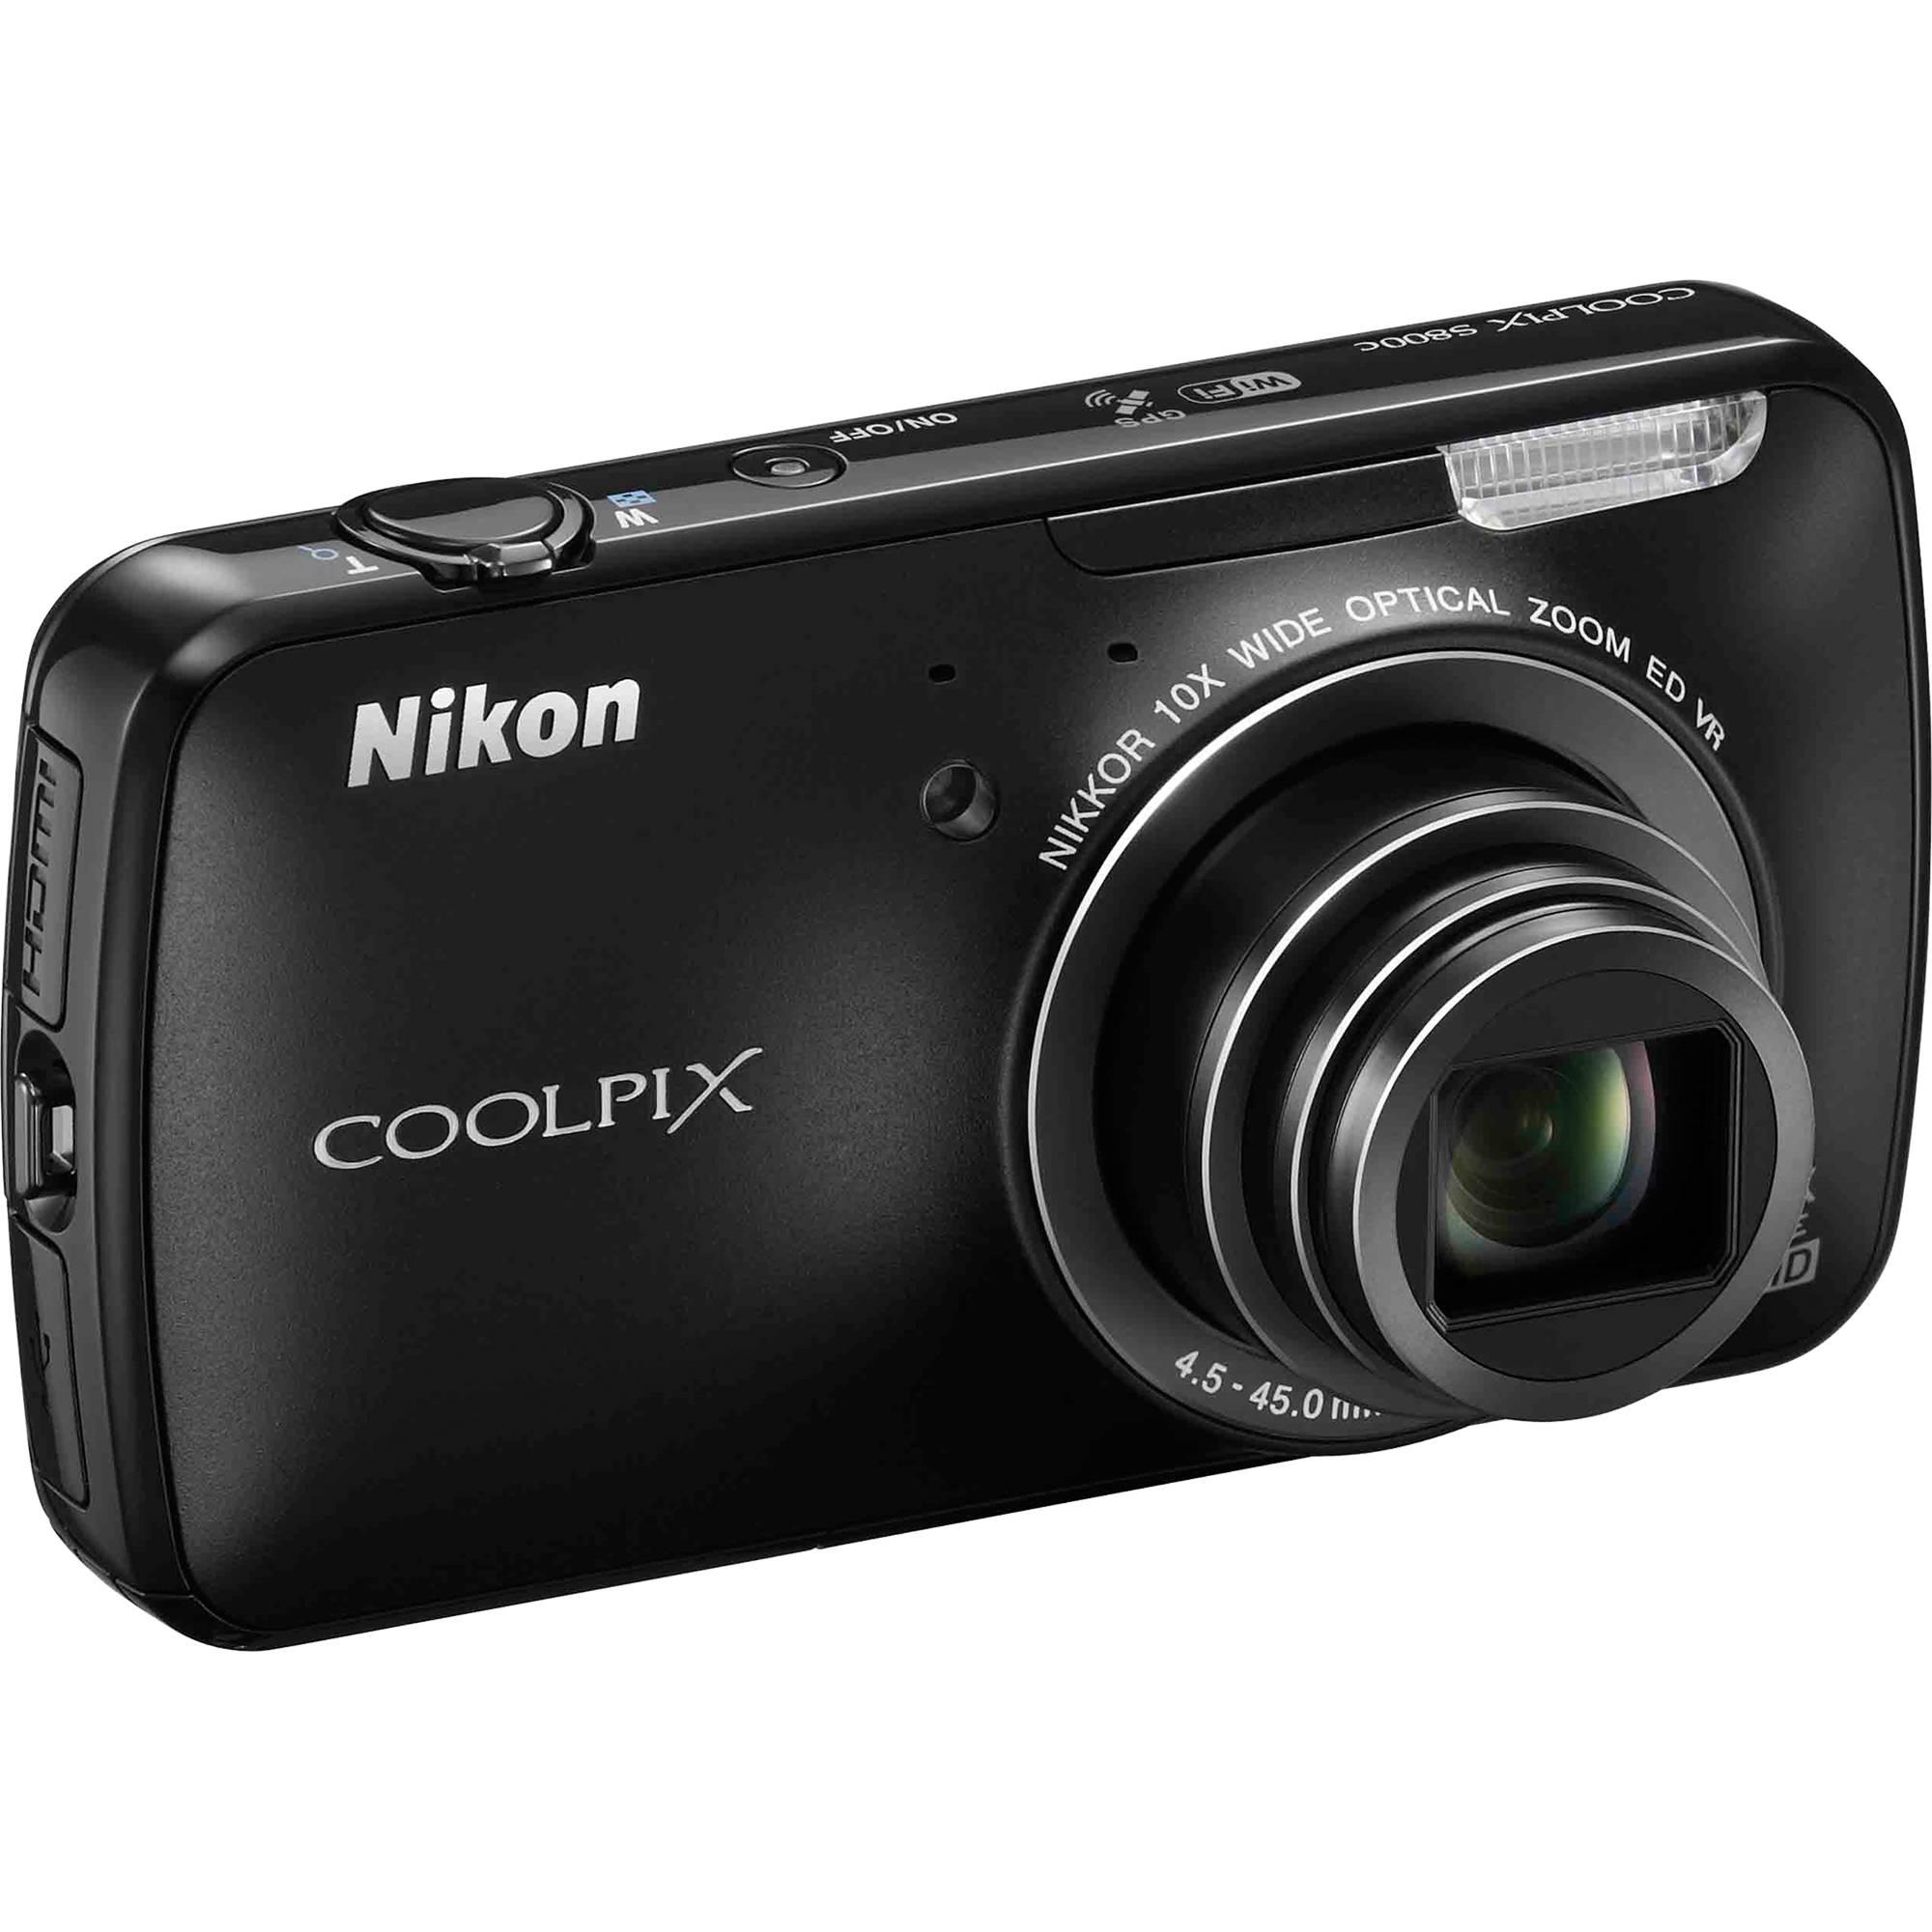 Nikon COOLPIX S800c Camera Descargar Controlador